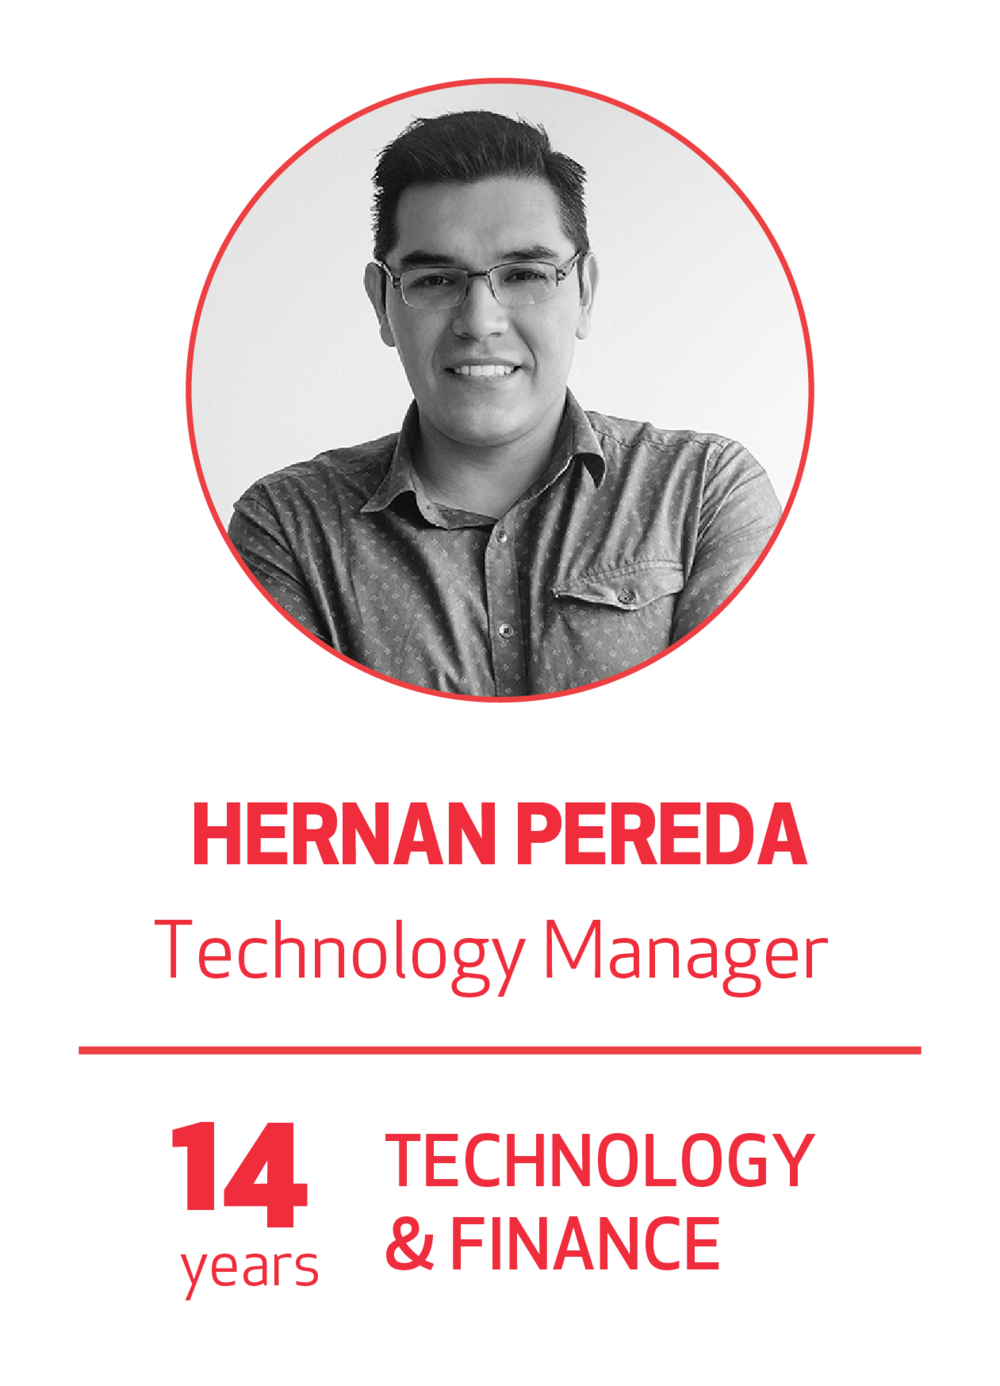 Hernan Pereda